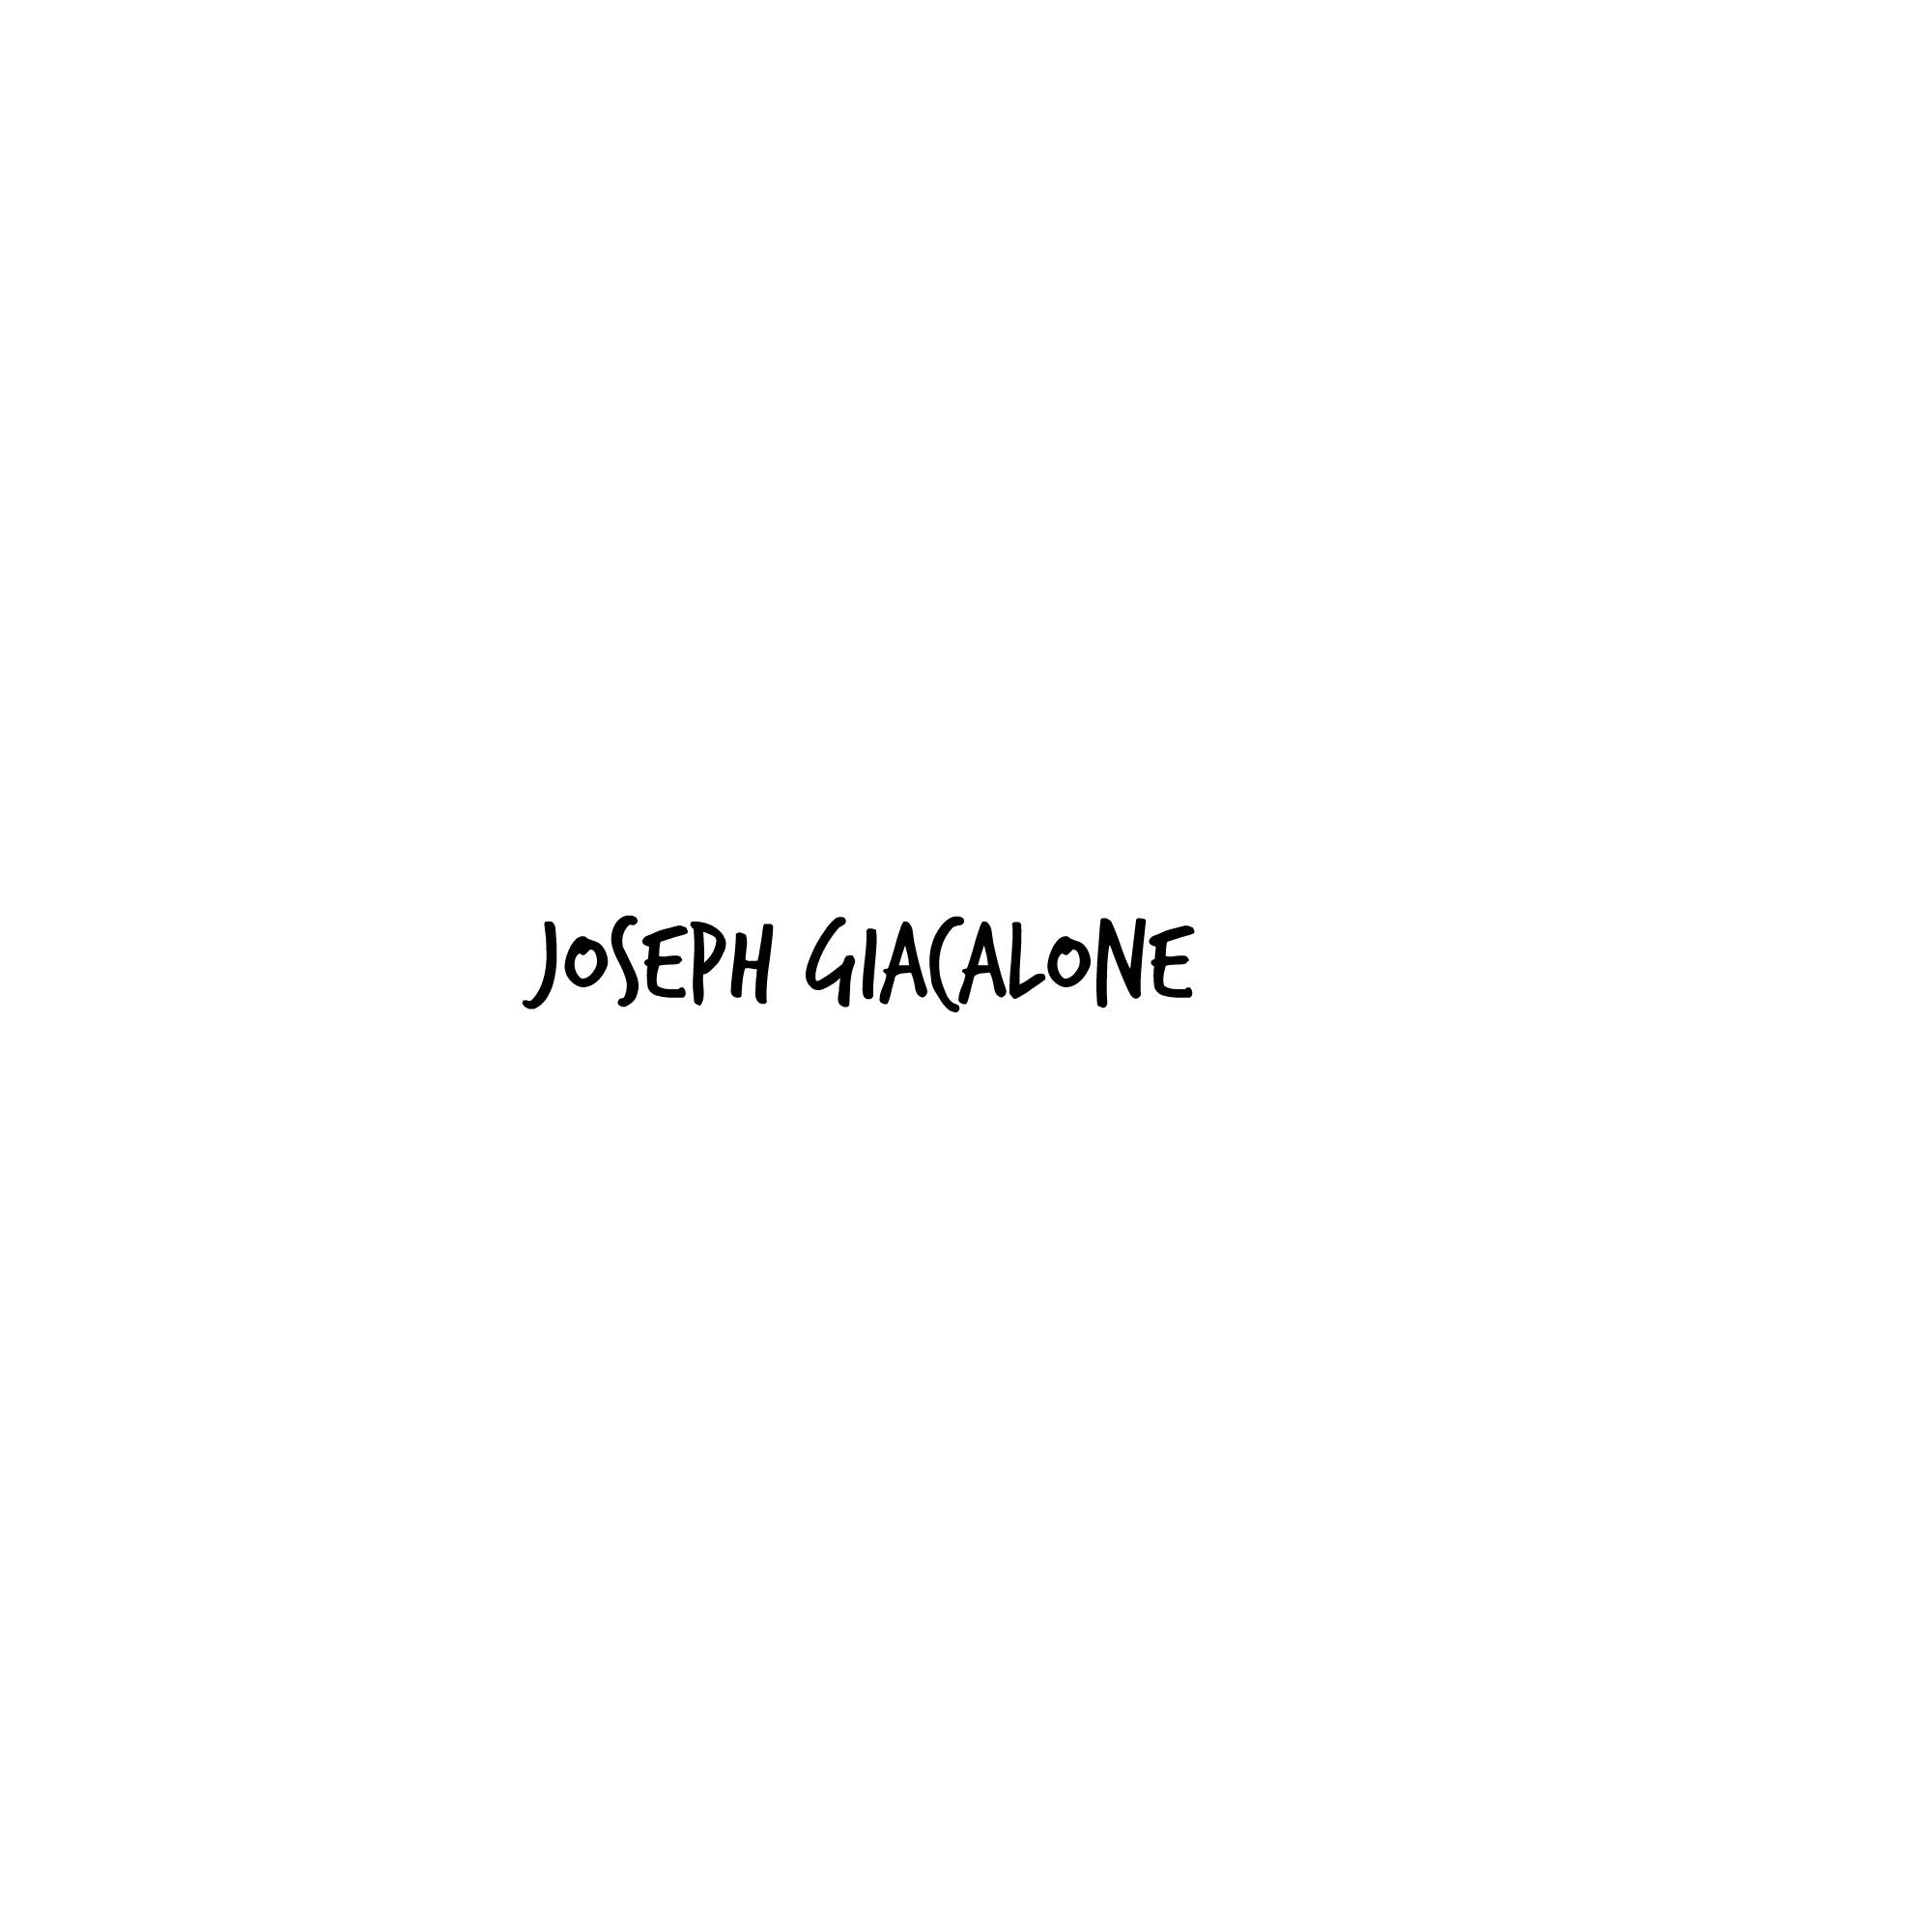 Joseph Giacalone's Signature